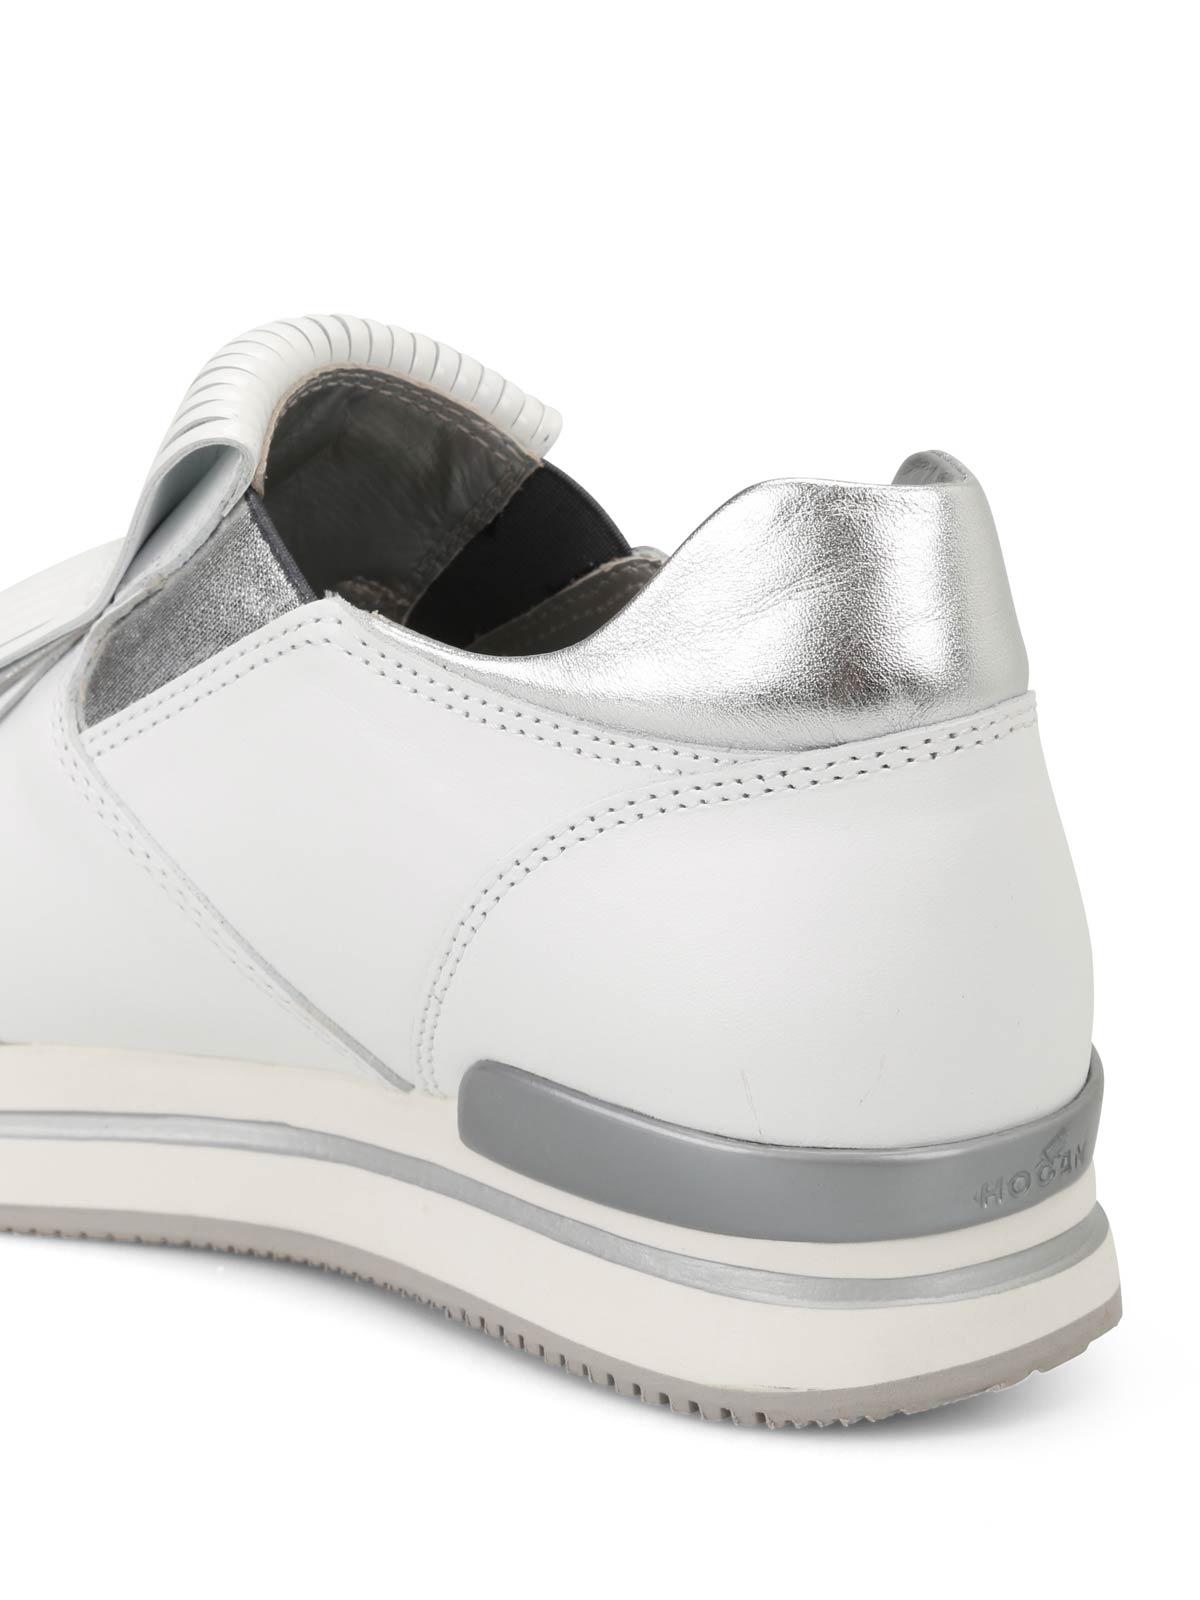 Hogan - H222 fringed slip-on sneakers - trainers - HXW2220AH80IEC0351